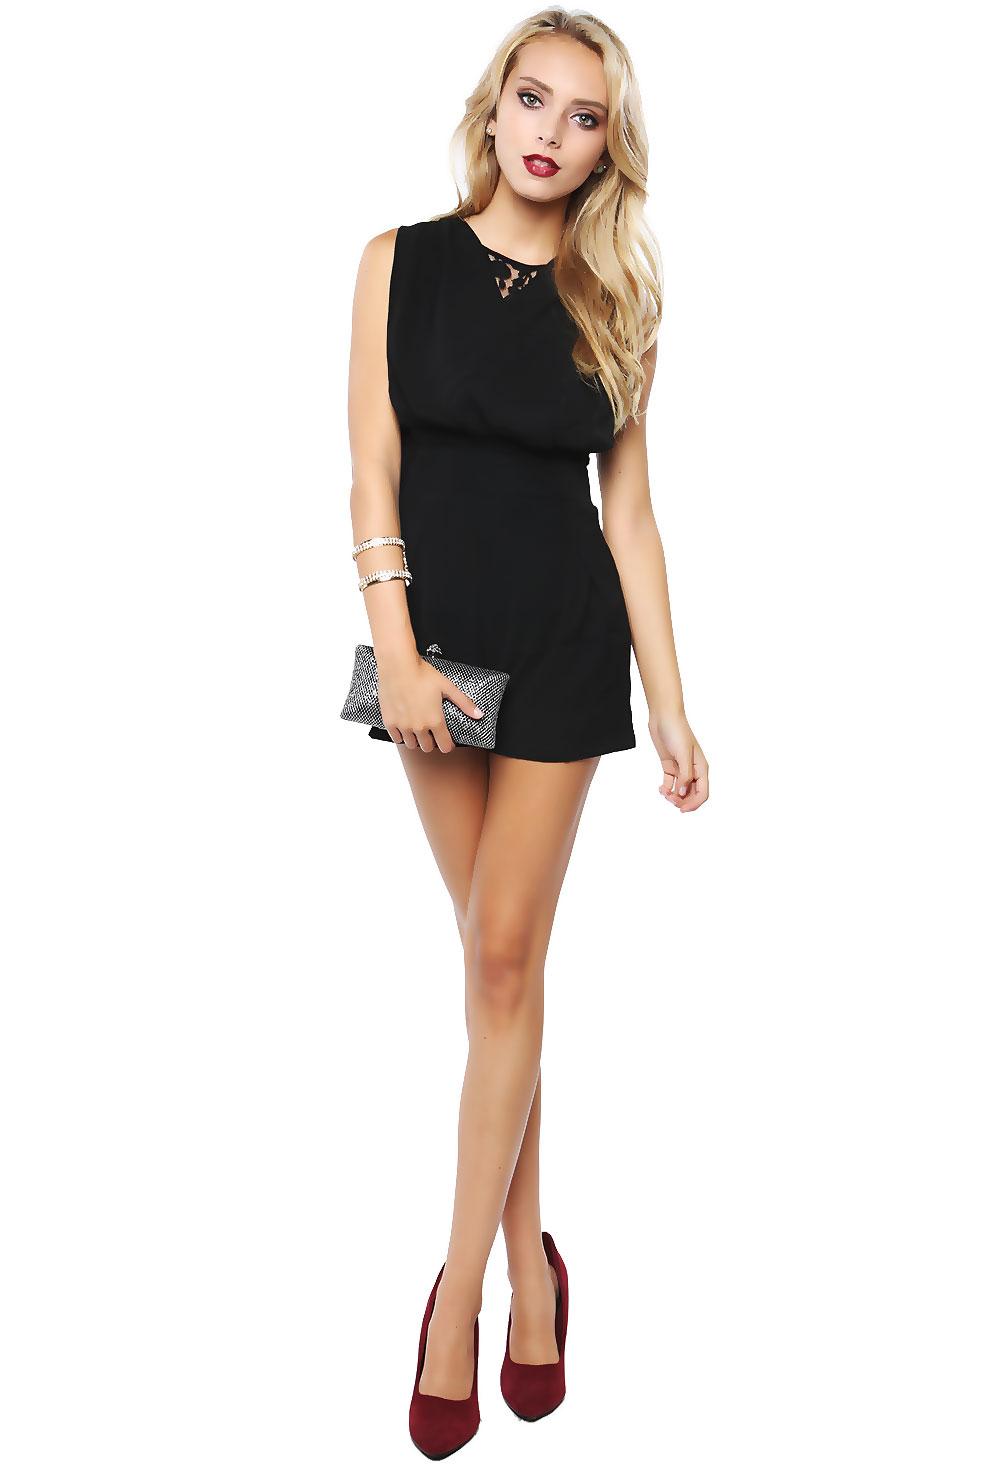 Innovative Womens39 Gorgeous Dressy Jumpsuit Size M NWT  EBay